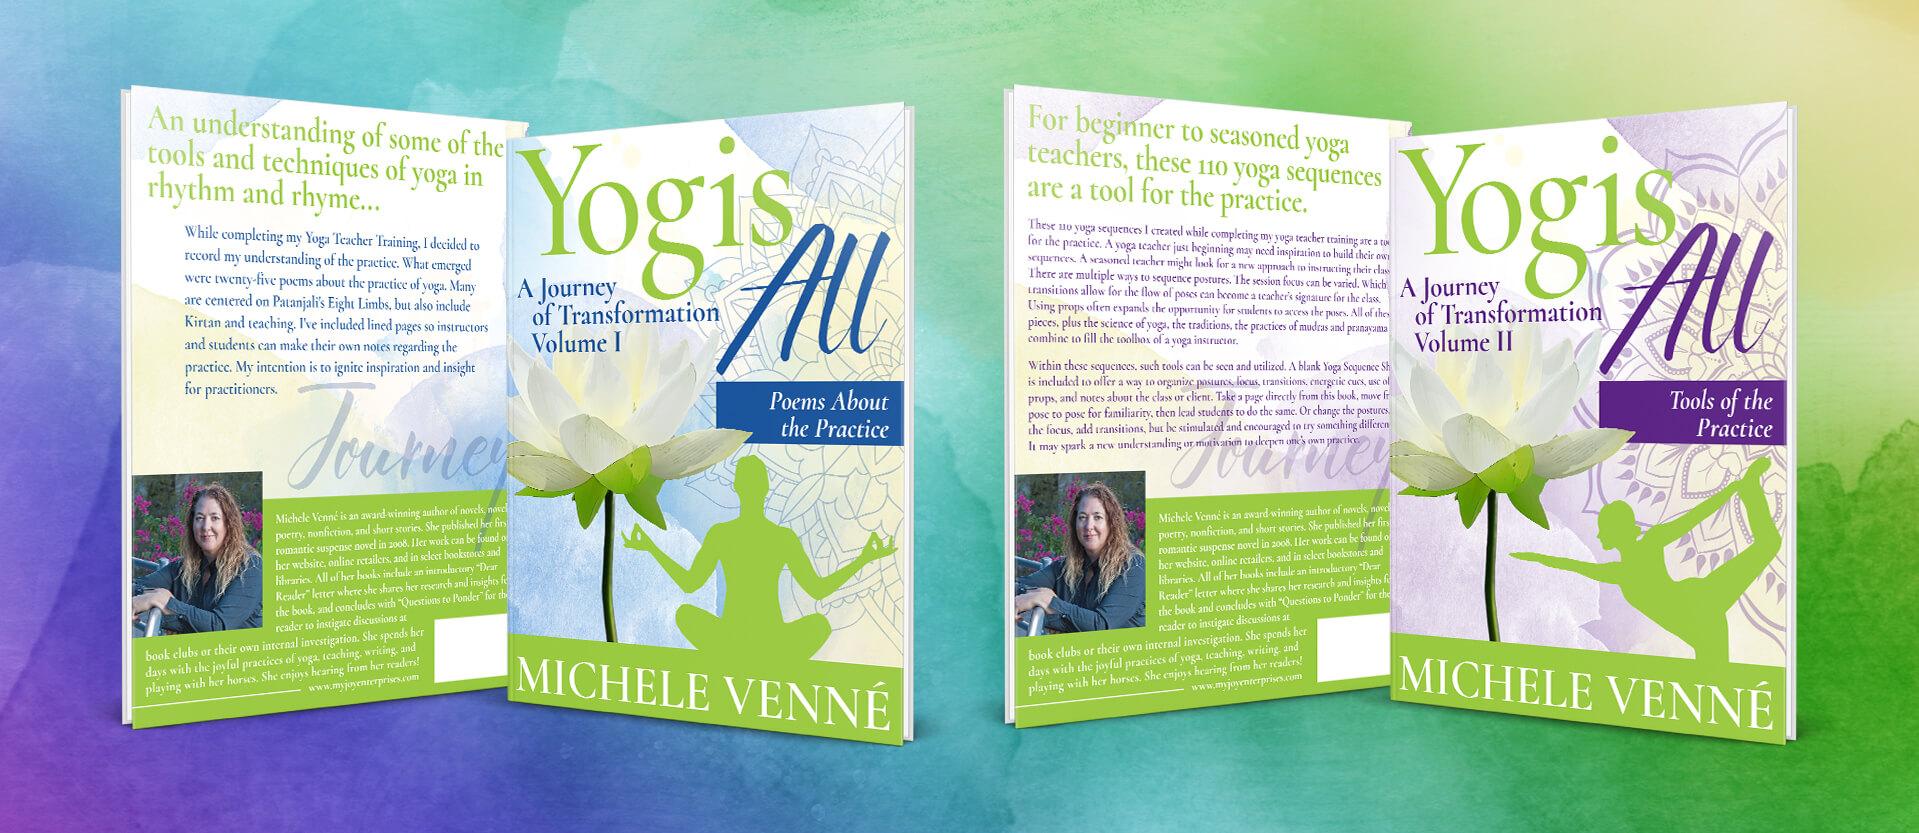 Author Michele Venne-Yogis All